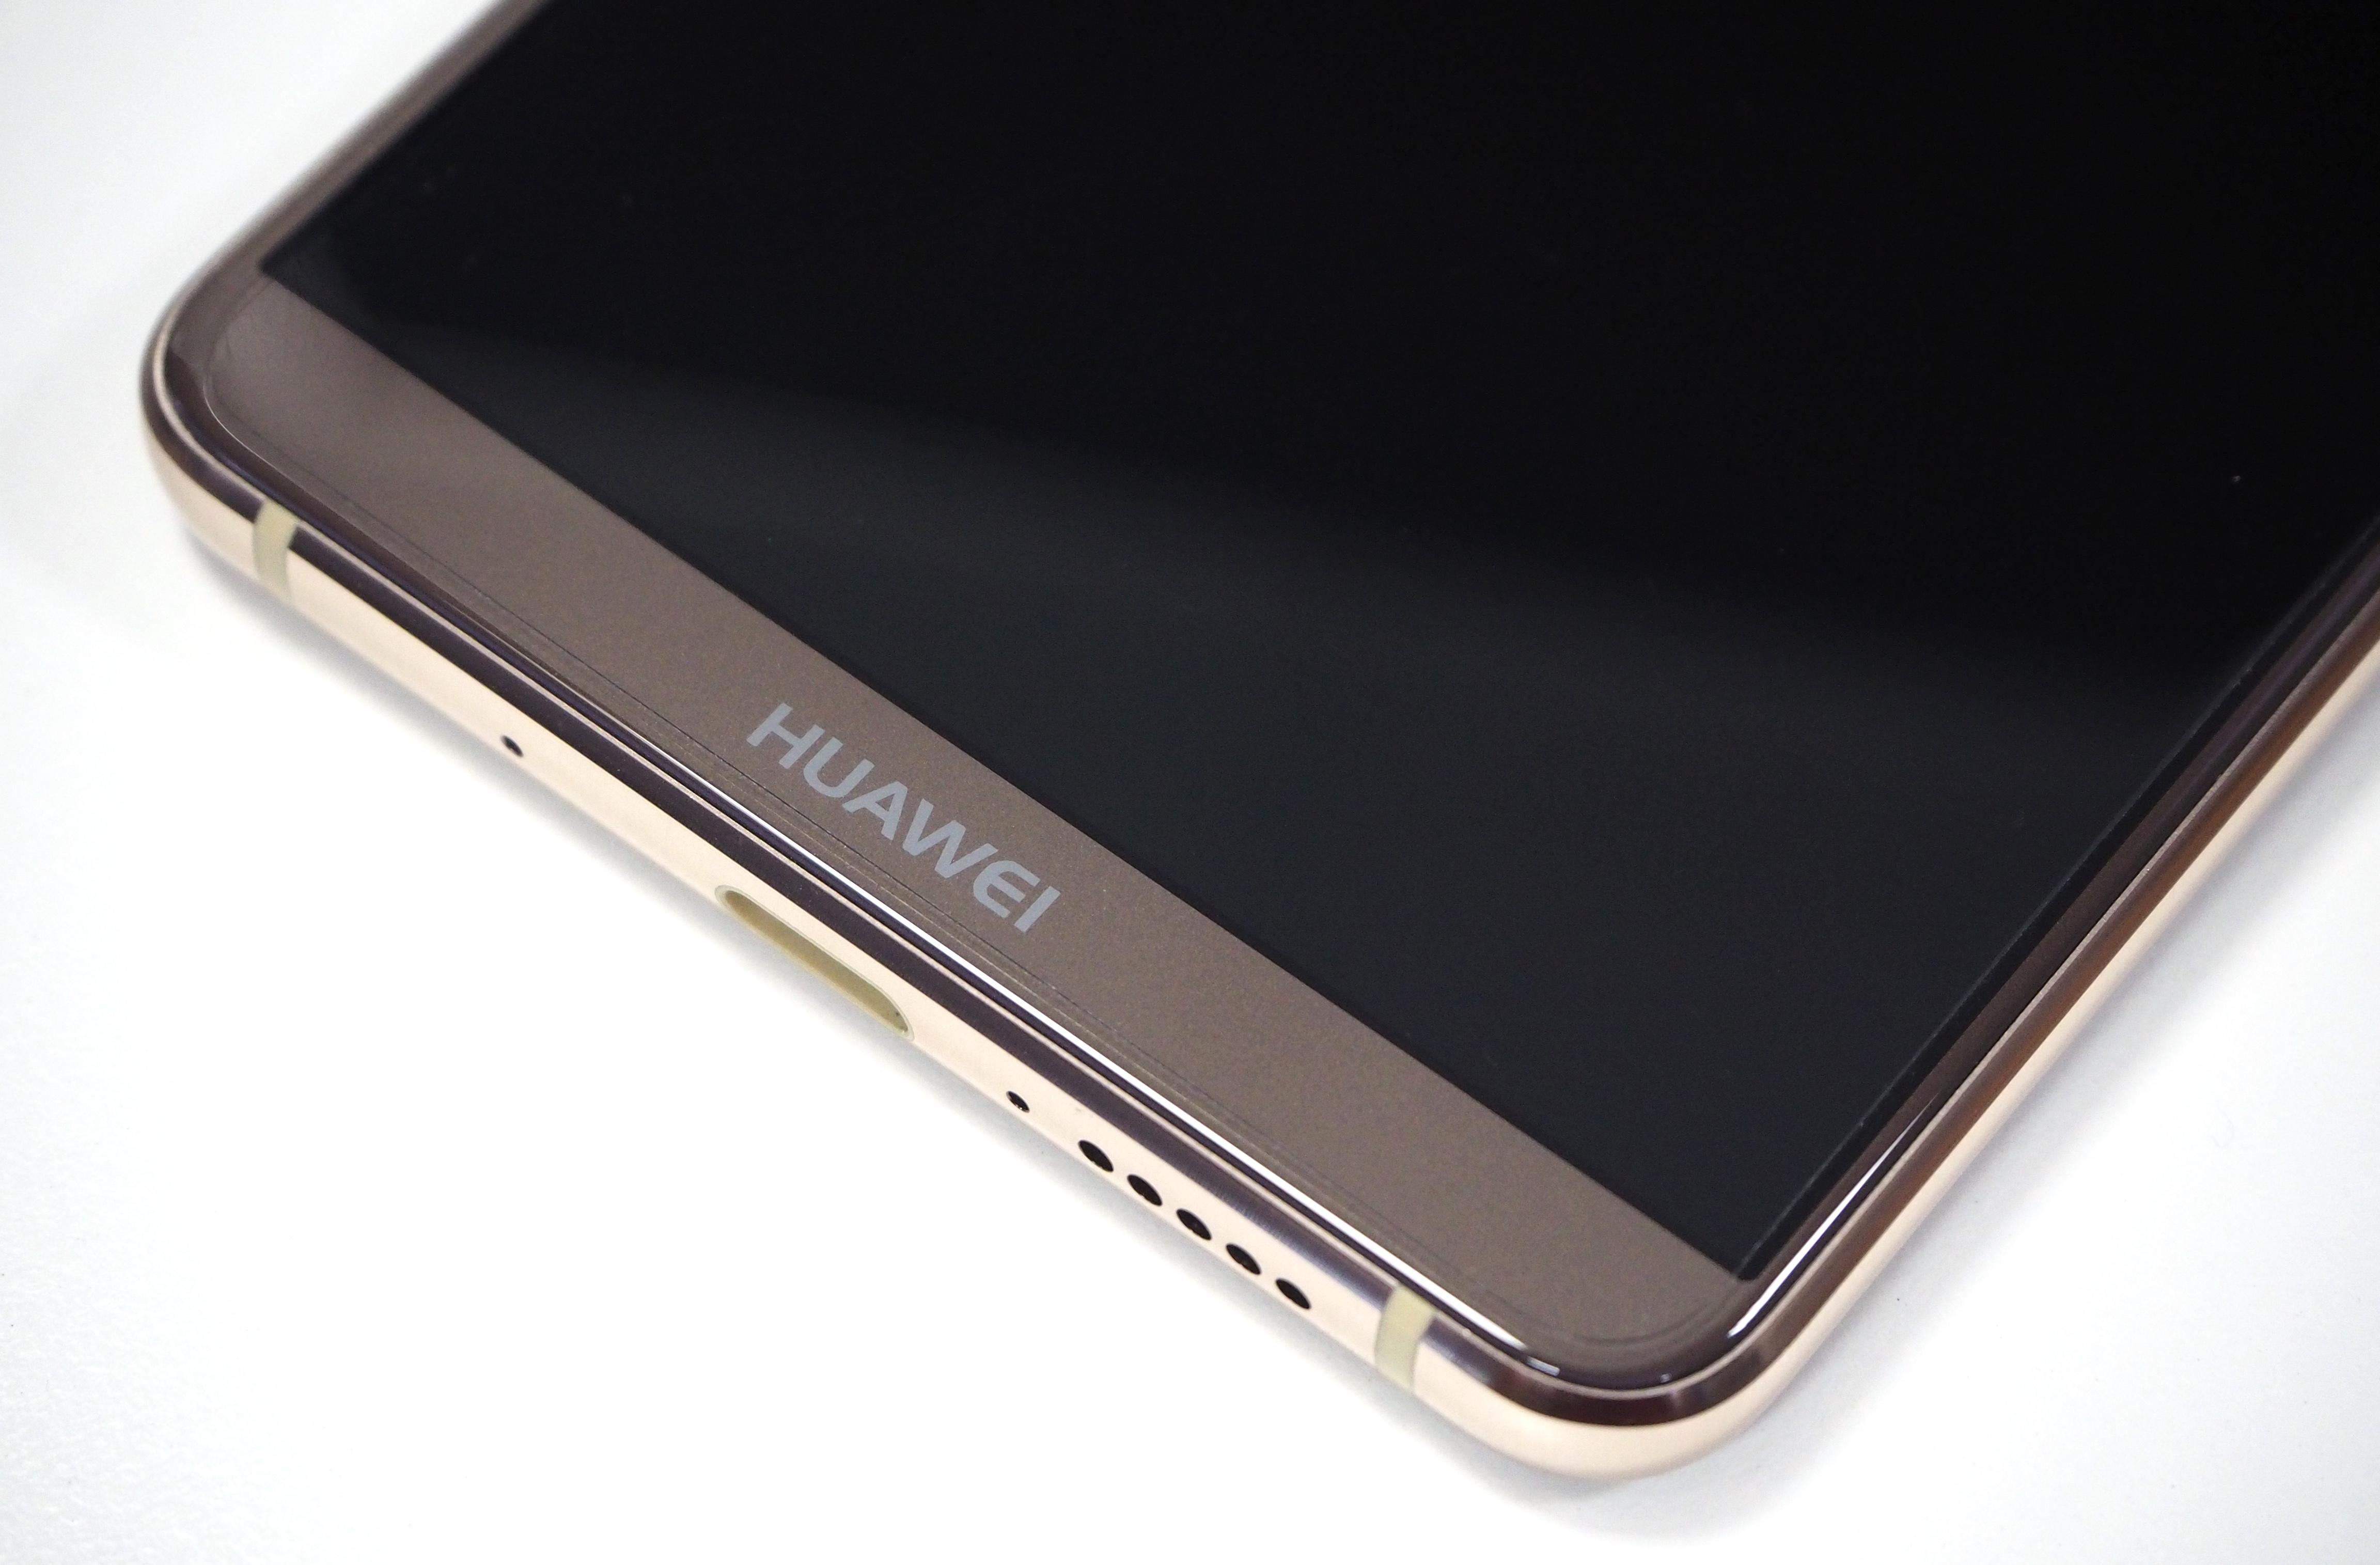 Huawei Mate 10 Pro Leica Dual Camera Review | ePHOTOzine